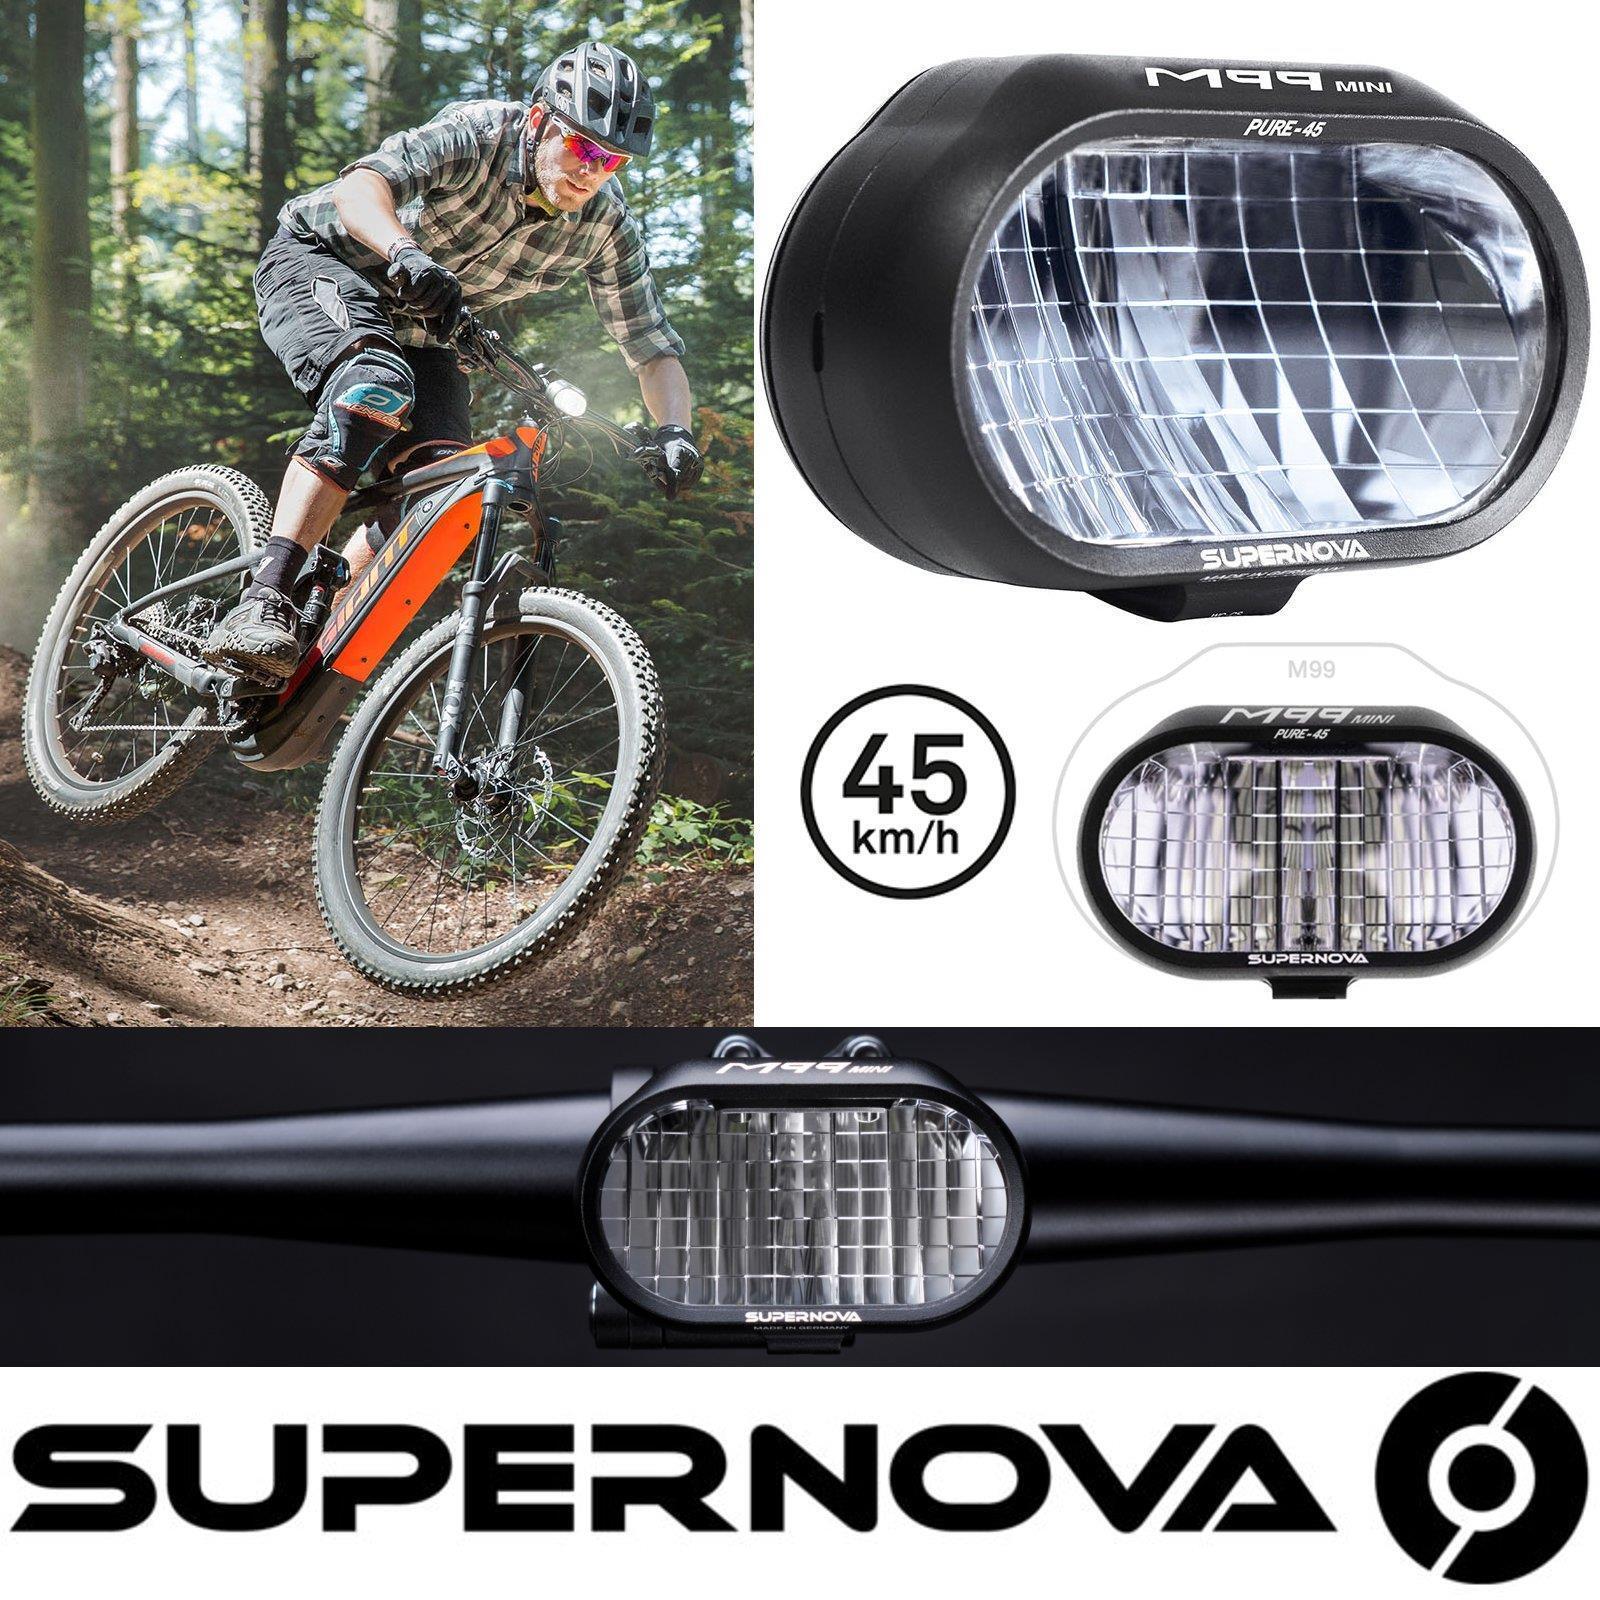 Supernova M99 Mini PURE-45 E-Bike Scheinwerfer LED Fahrrad  Licht 7,2W  general high quality